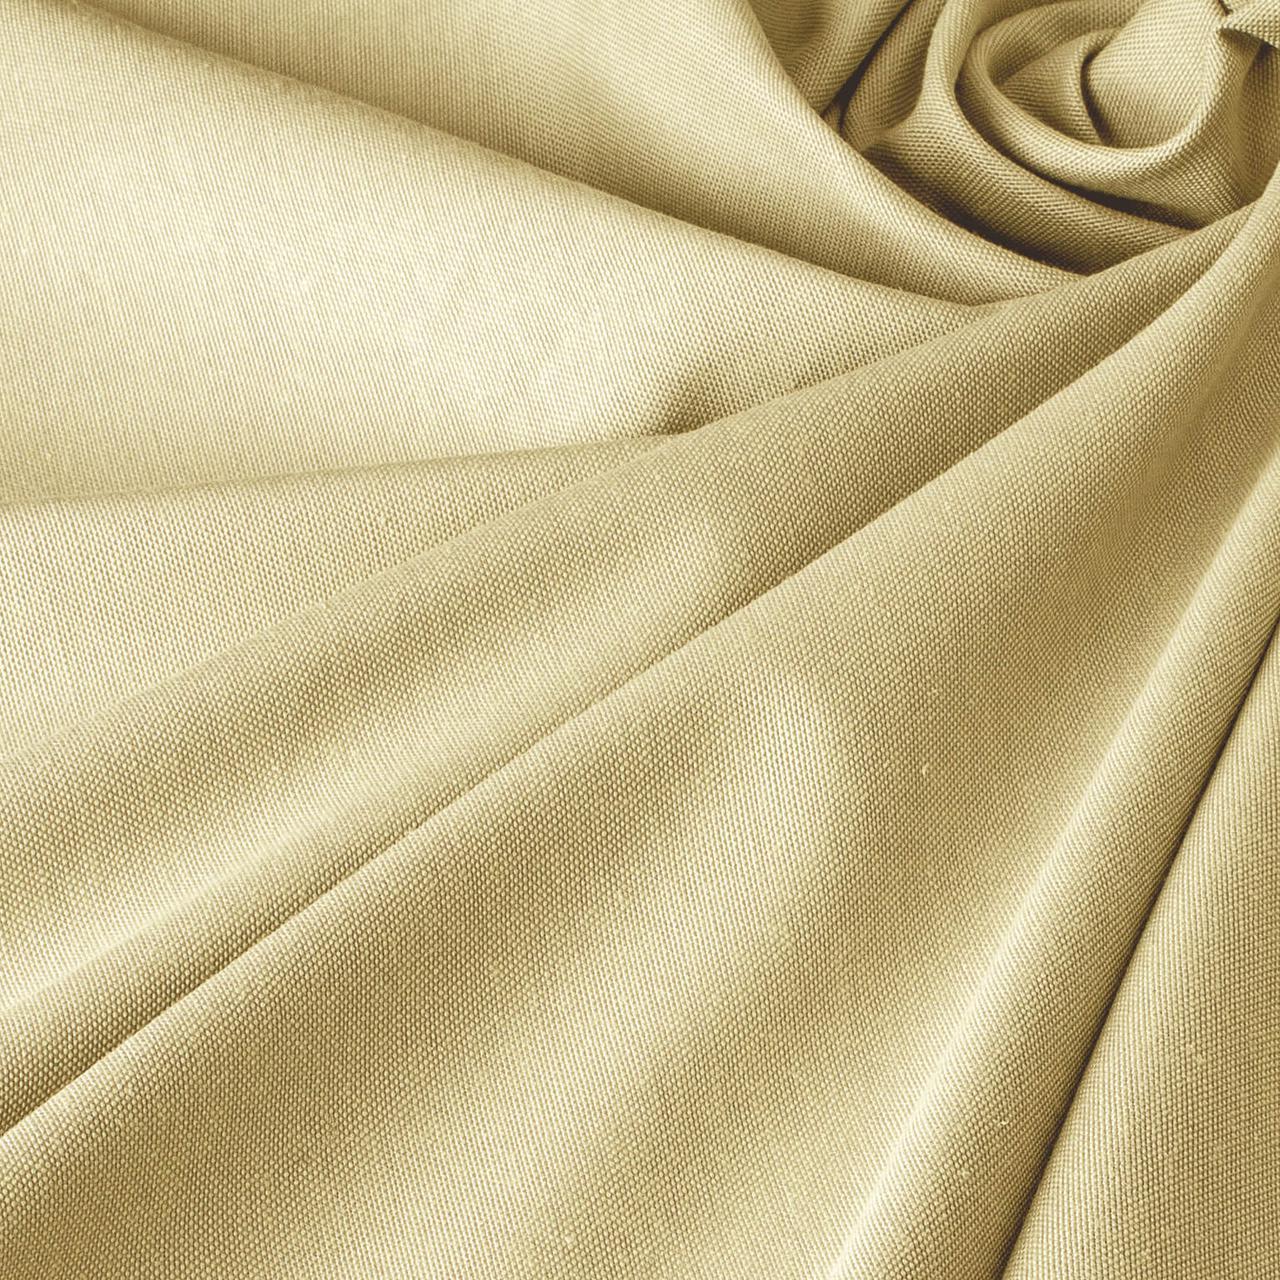 Ткань для штор и скатертей Teflon DRS v 3852